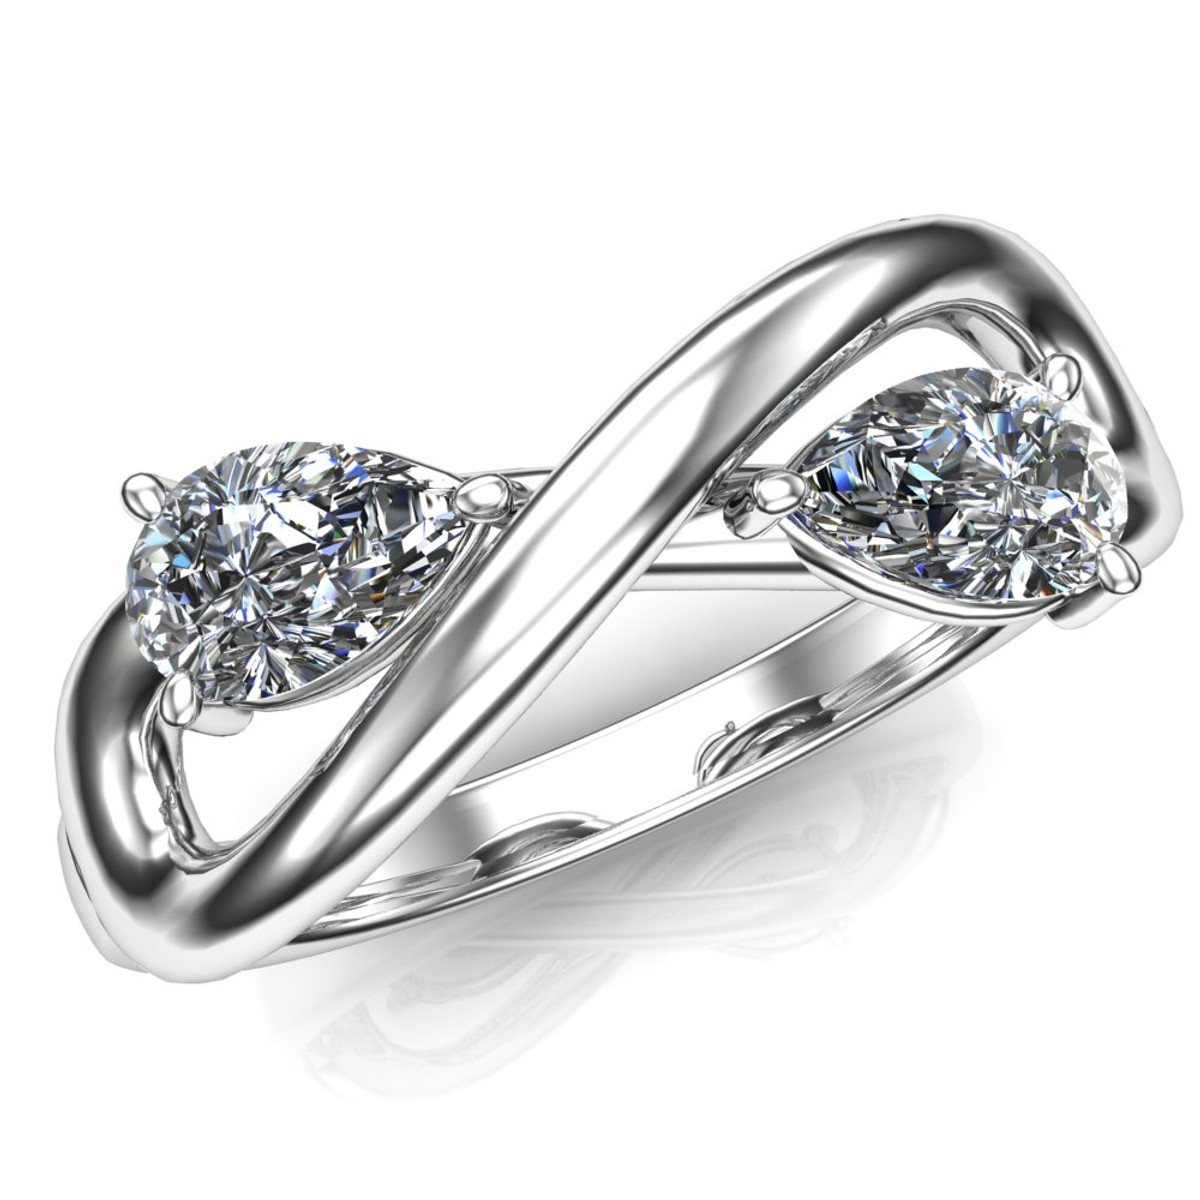 criss nixin ring cross diamond band pin gold infinity wedding engagement